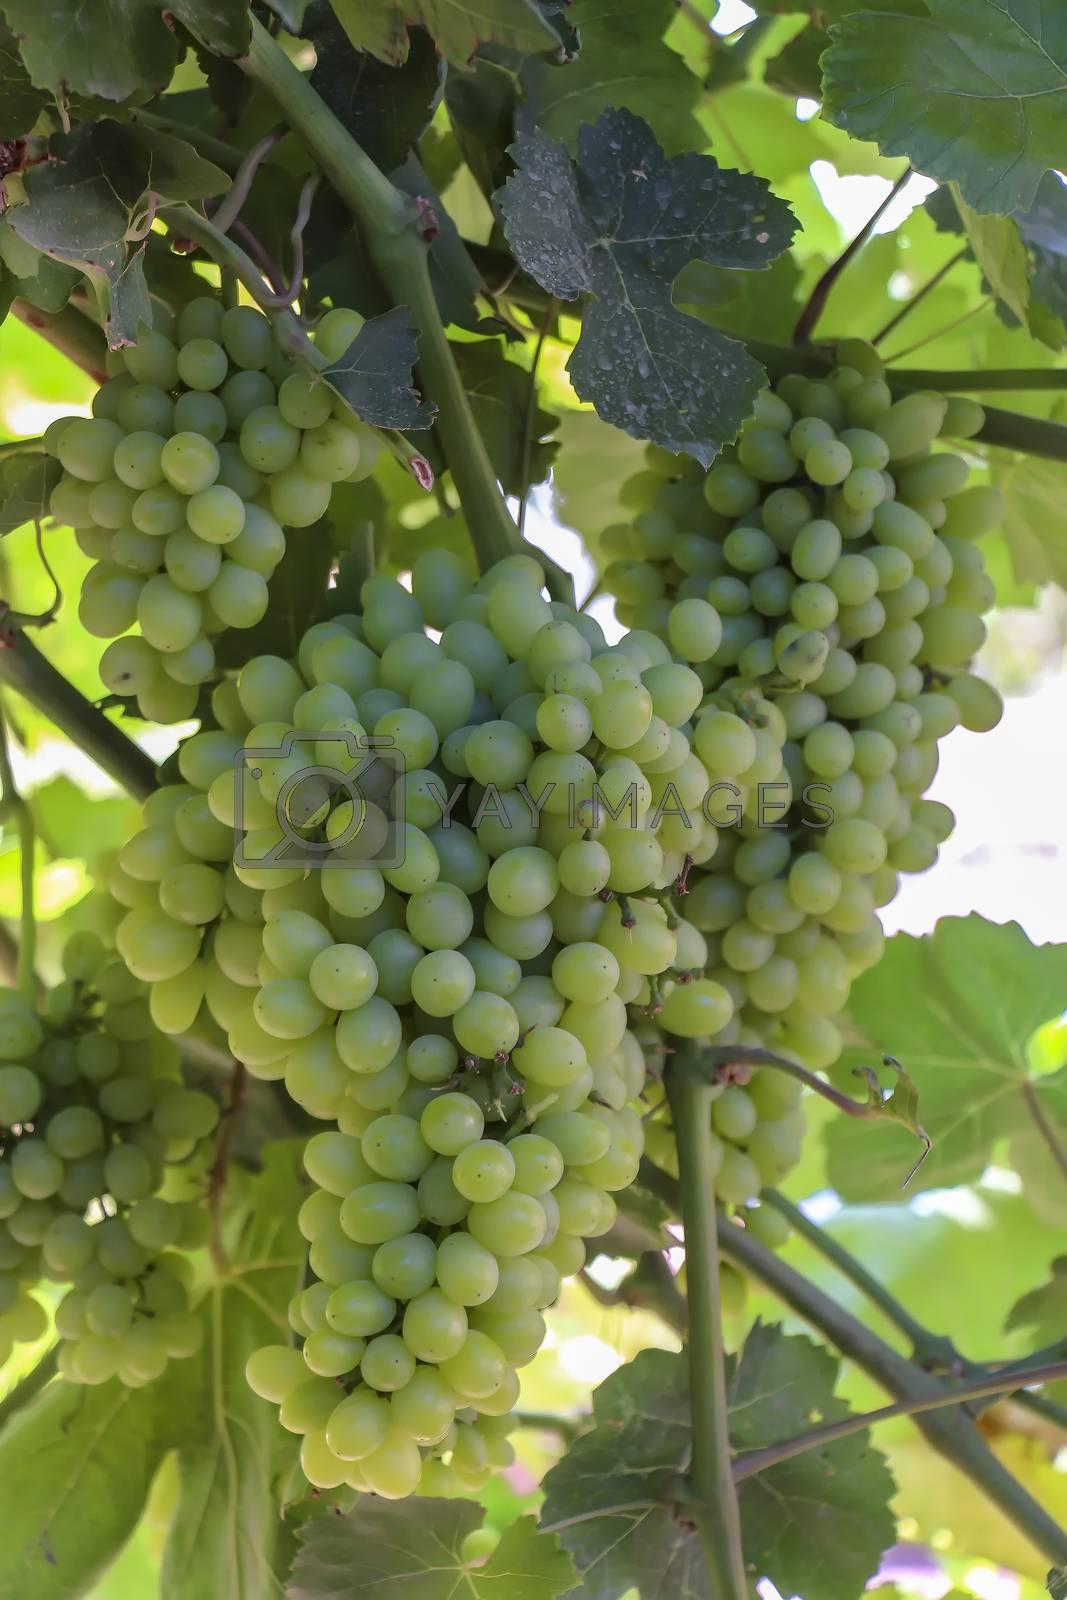 Unripe grapes hanging from the trellises on Qingnian Lu, Turpan, Xinjiang